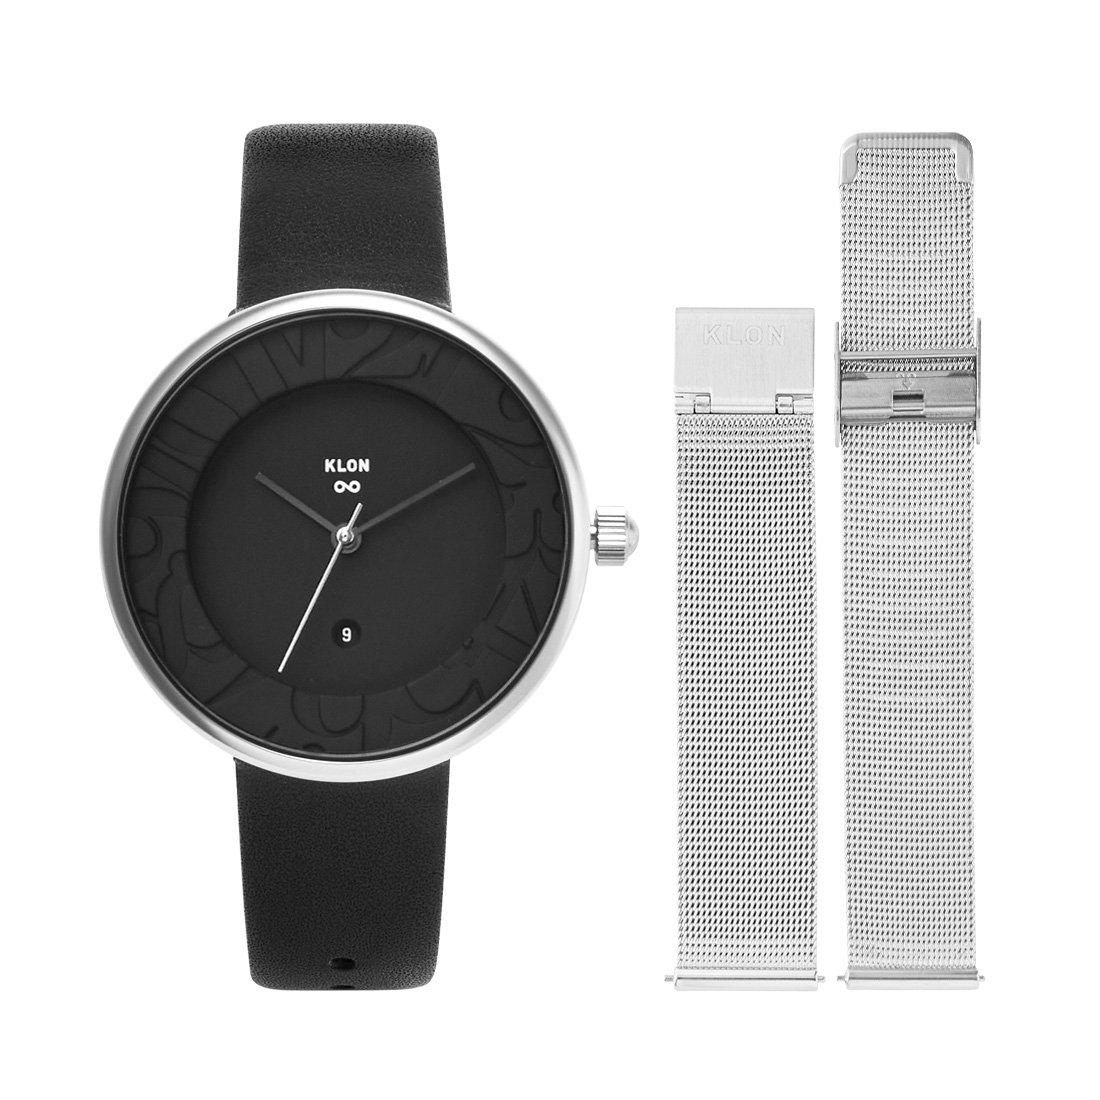 KLON INFINITY STAIR series -RONDO TIME- [36/B-FACE]